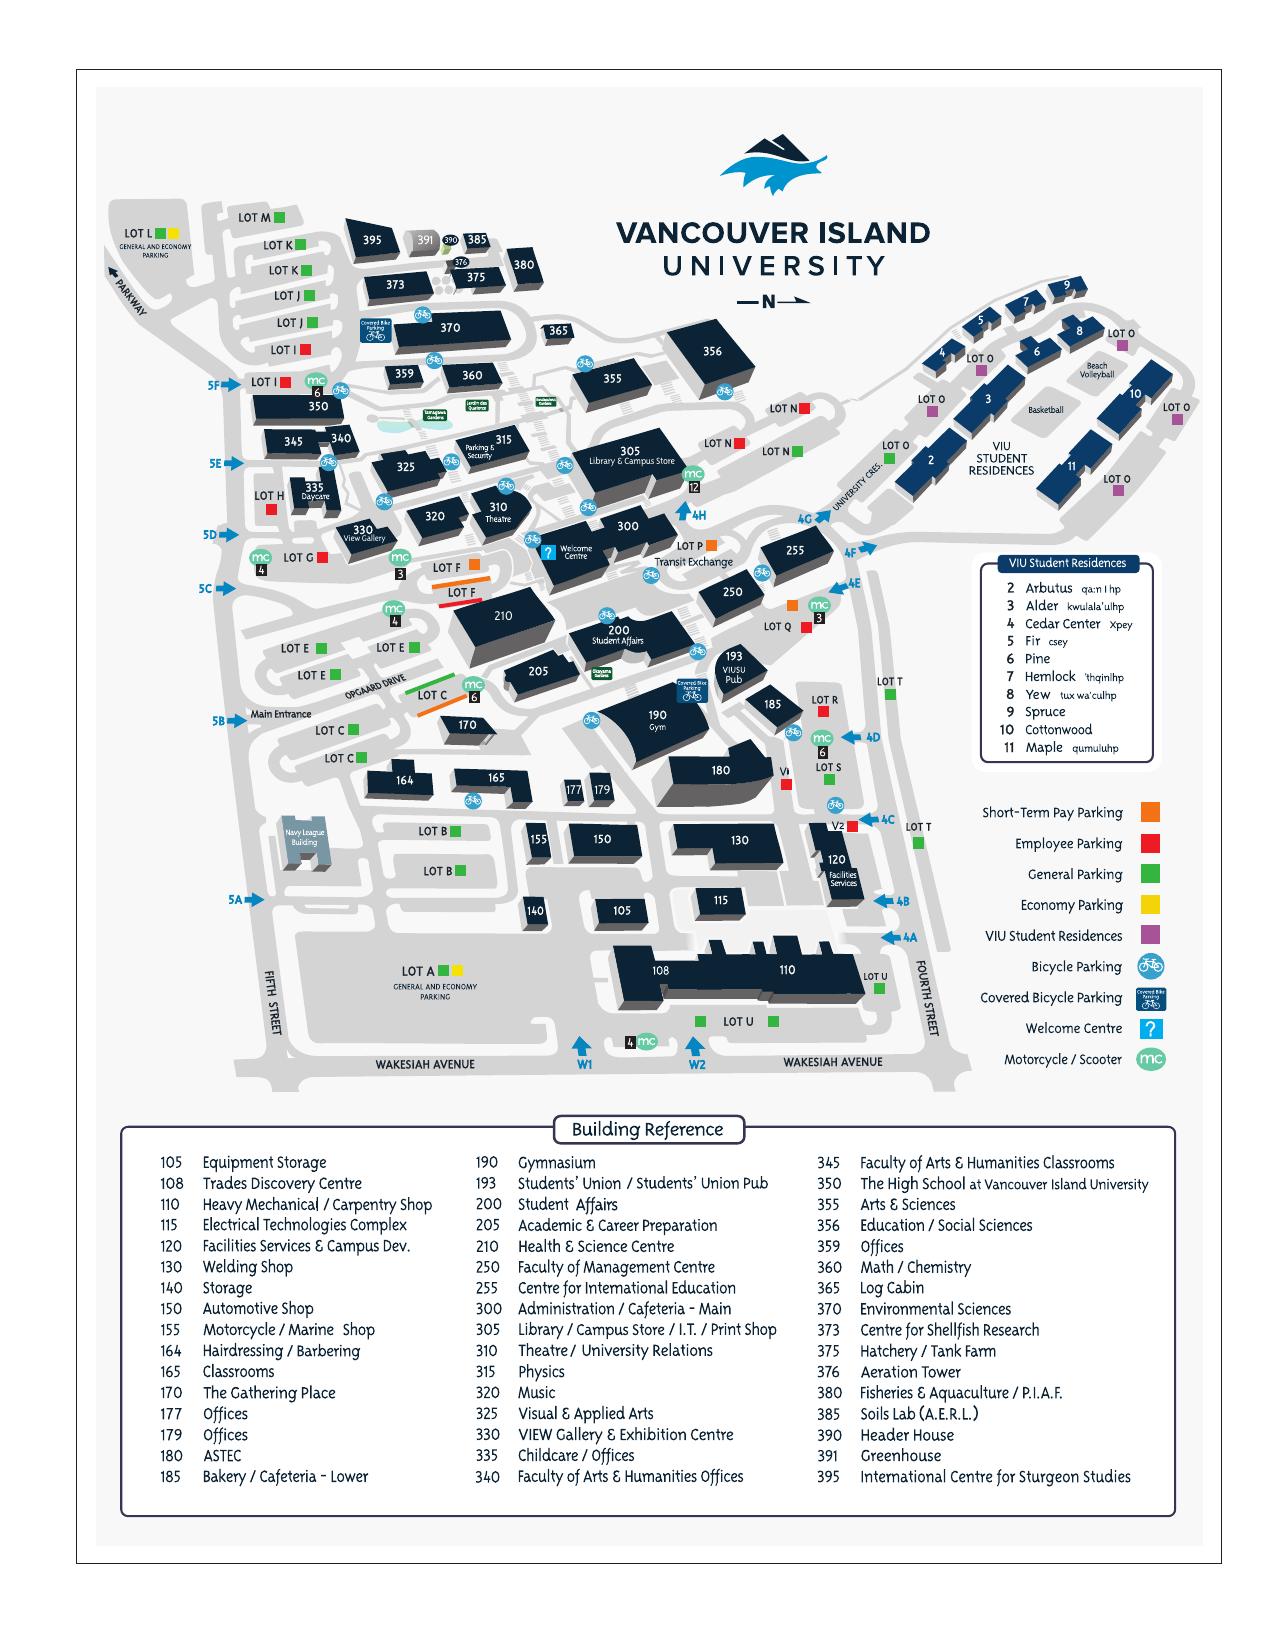 viu nanaimo campus map Viu Nanaimo Campus Map viu nanaimo campus map